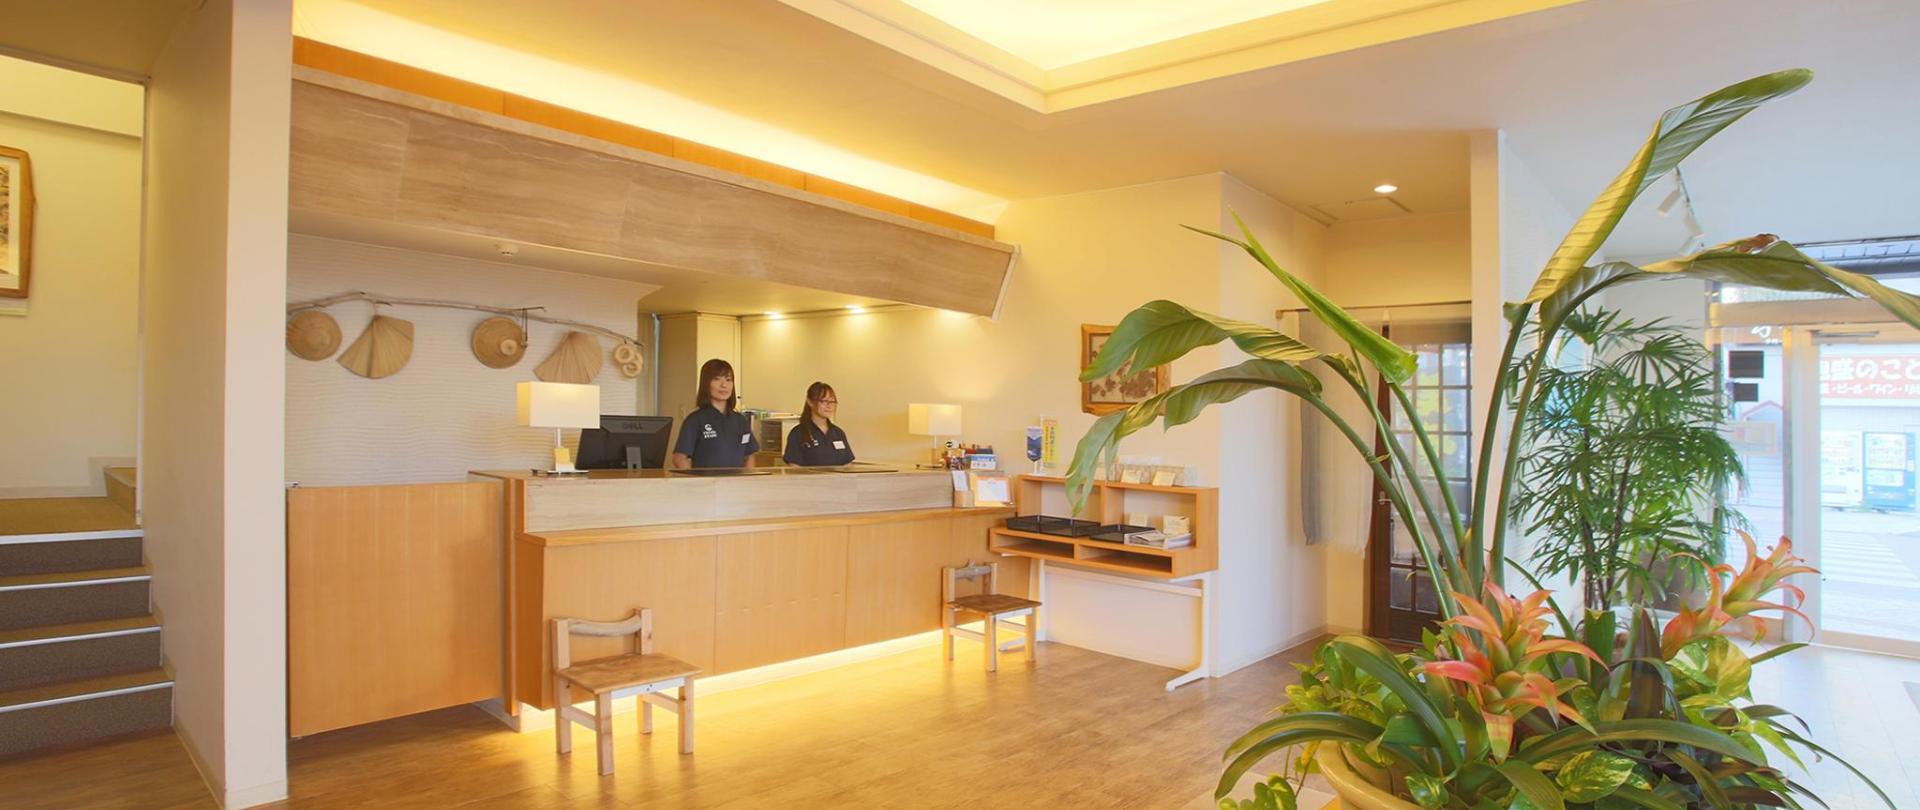 Ishigakijima Hotel Cucule